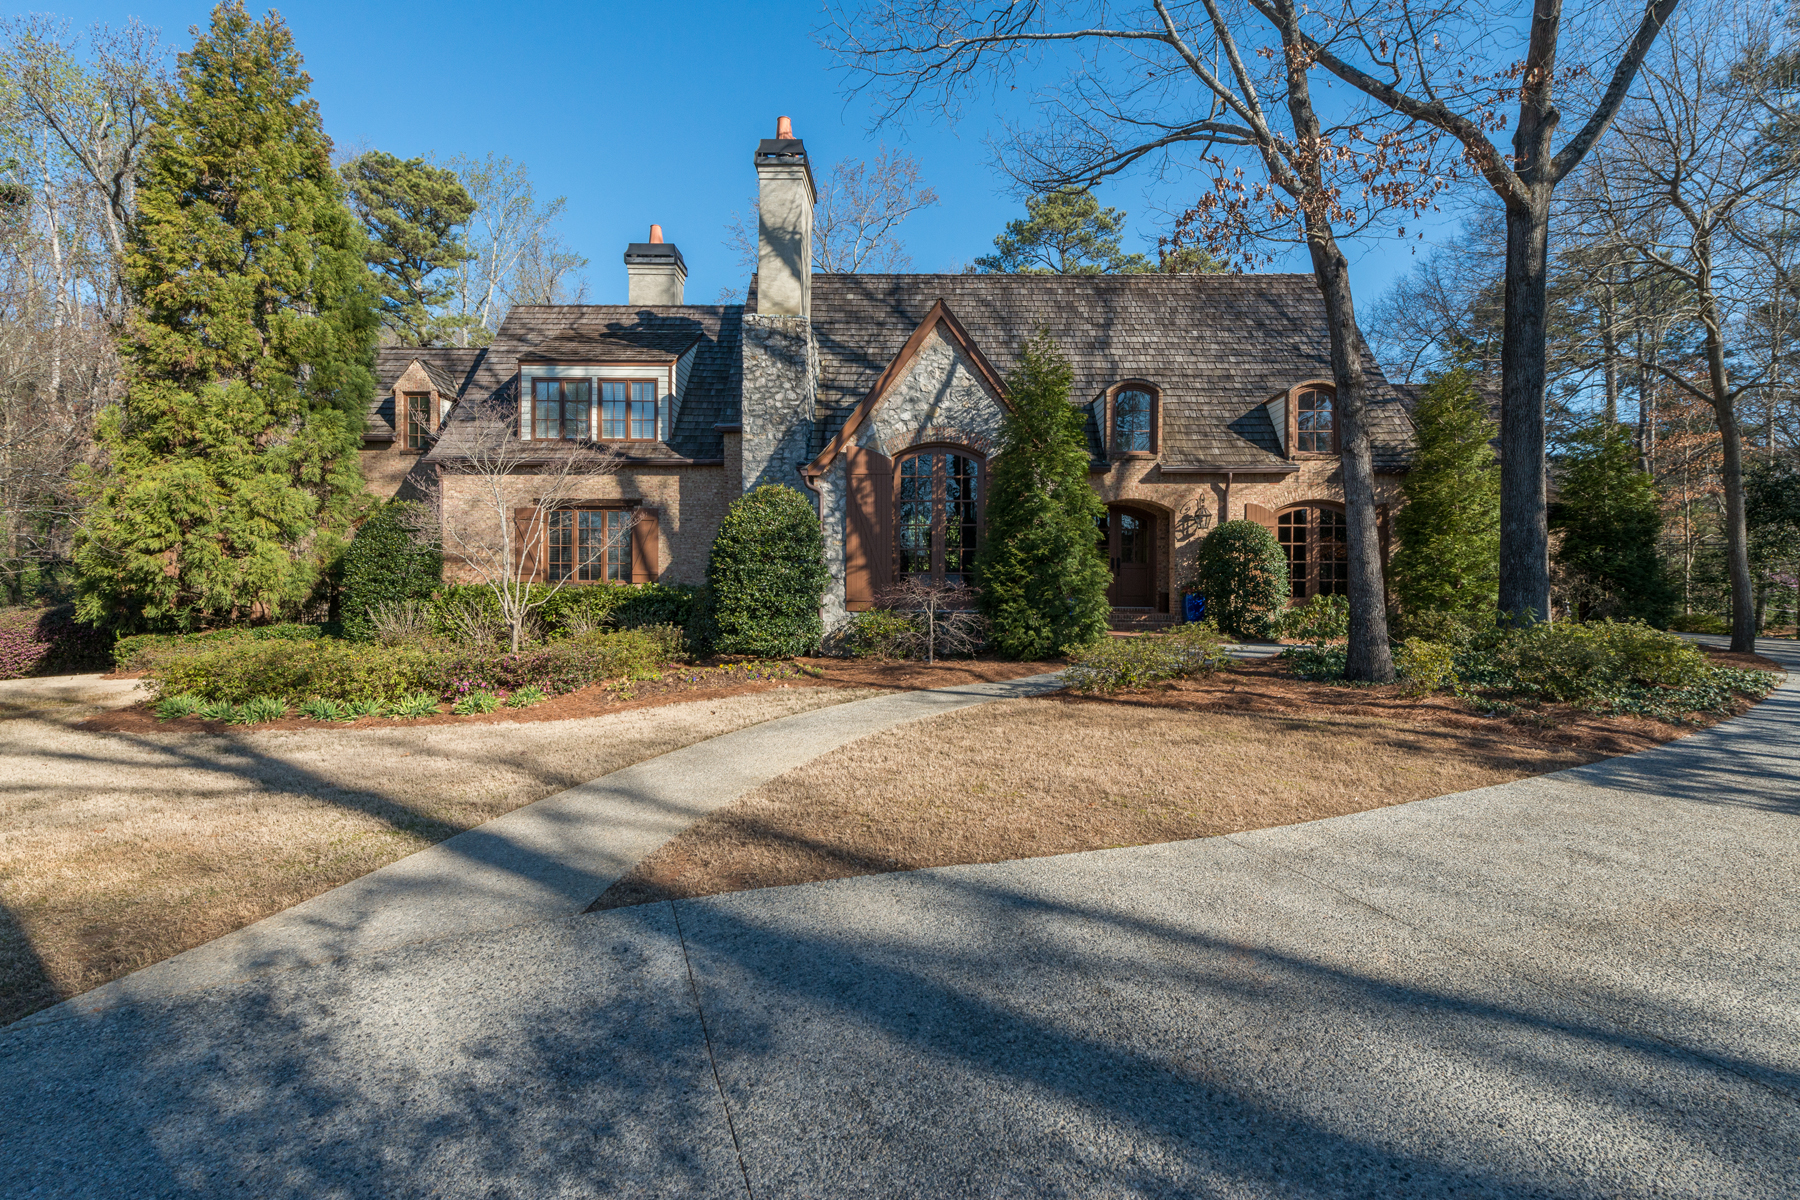 独户住宅 为 销售 在 Sandy Springs Sophistication On One Acre 102 Kingston Manor 桑迪, 乔治亚州, 30342 美国